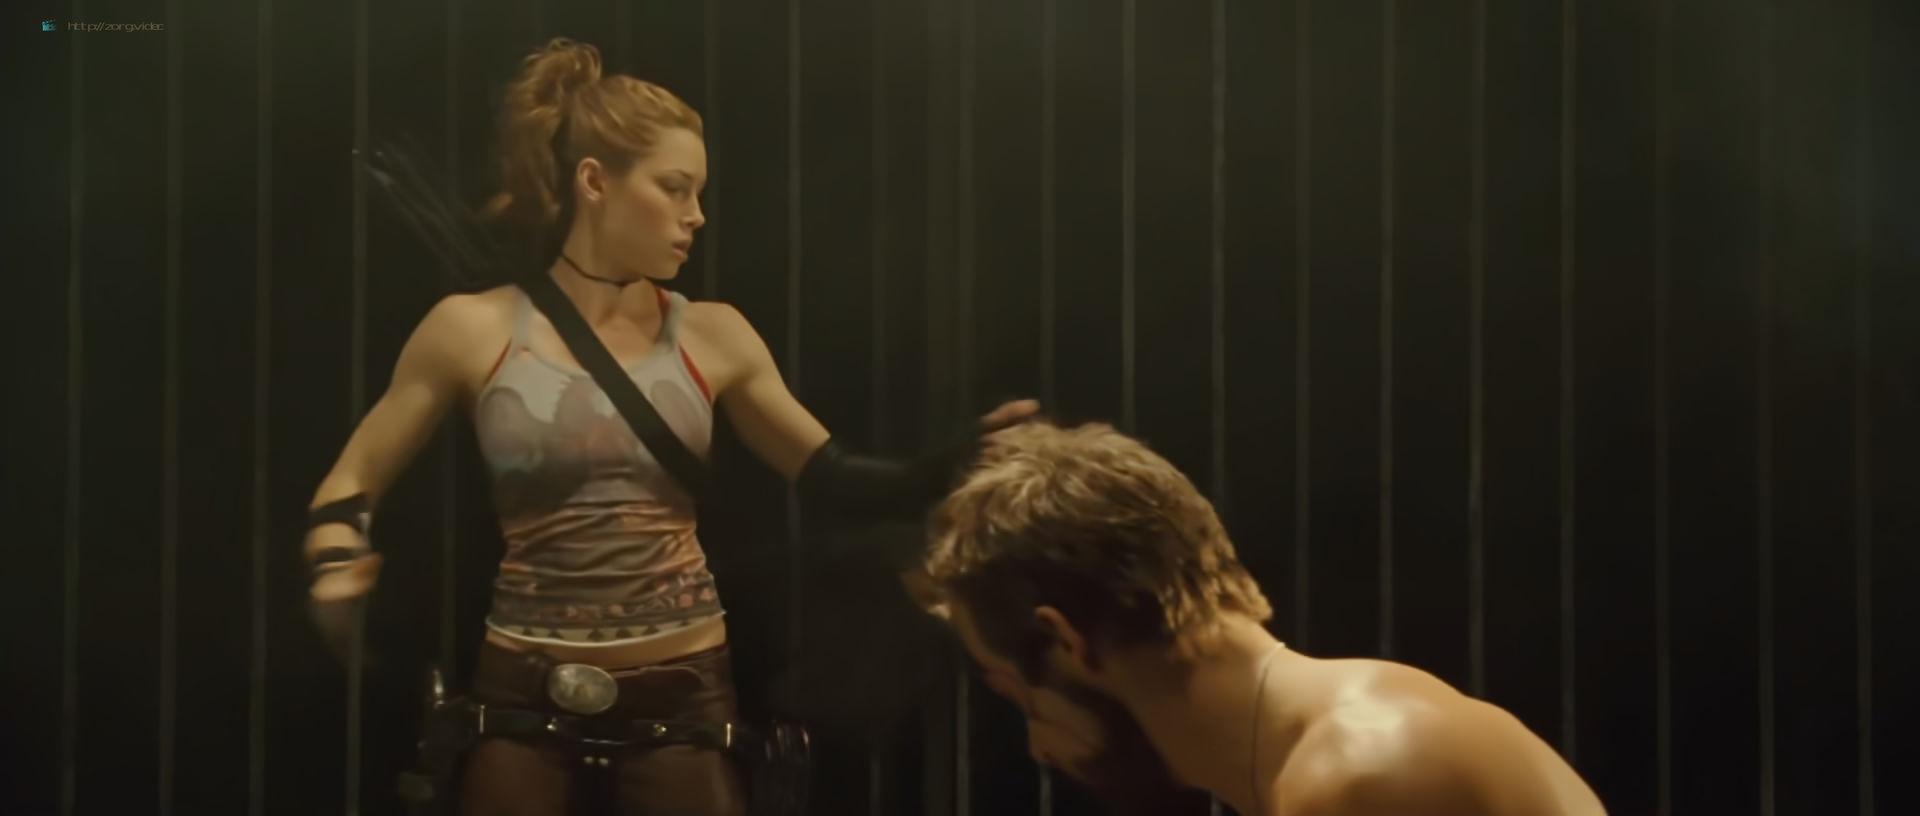 Jessica Biel hot and sexy - Blade Trinity (2004) HD 1080p BluRay (9)